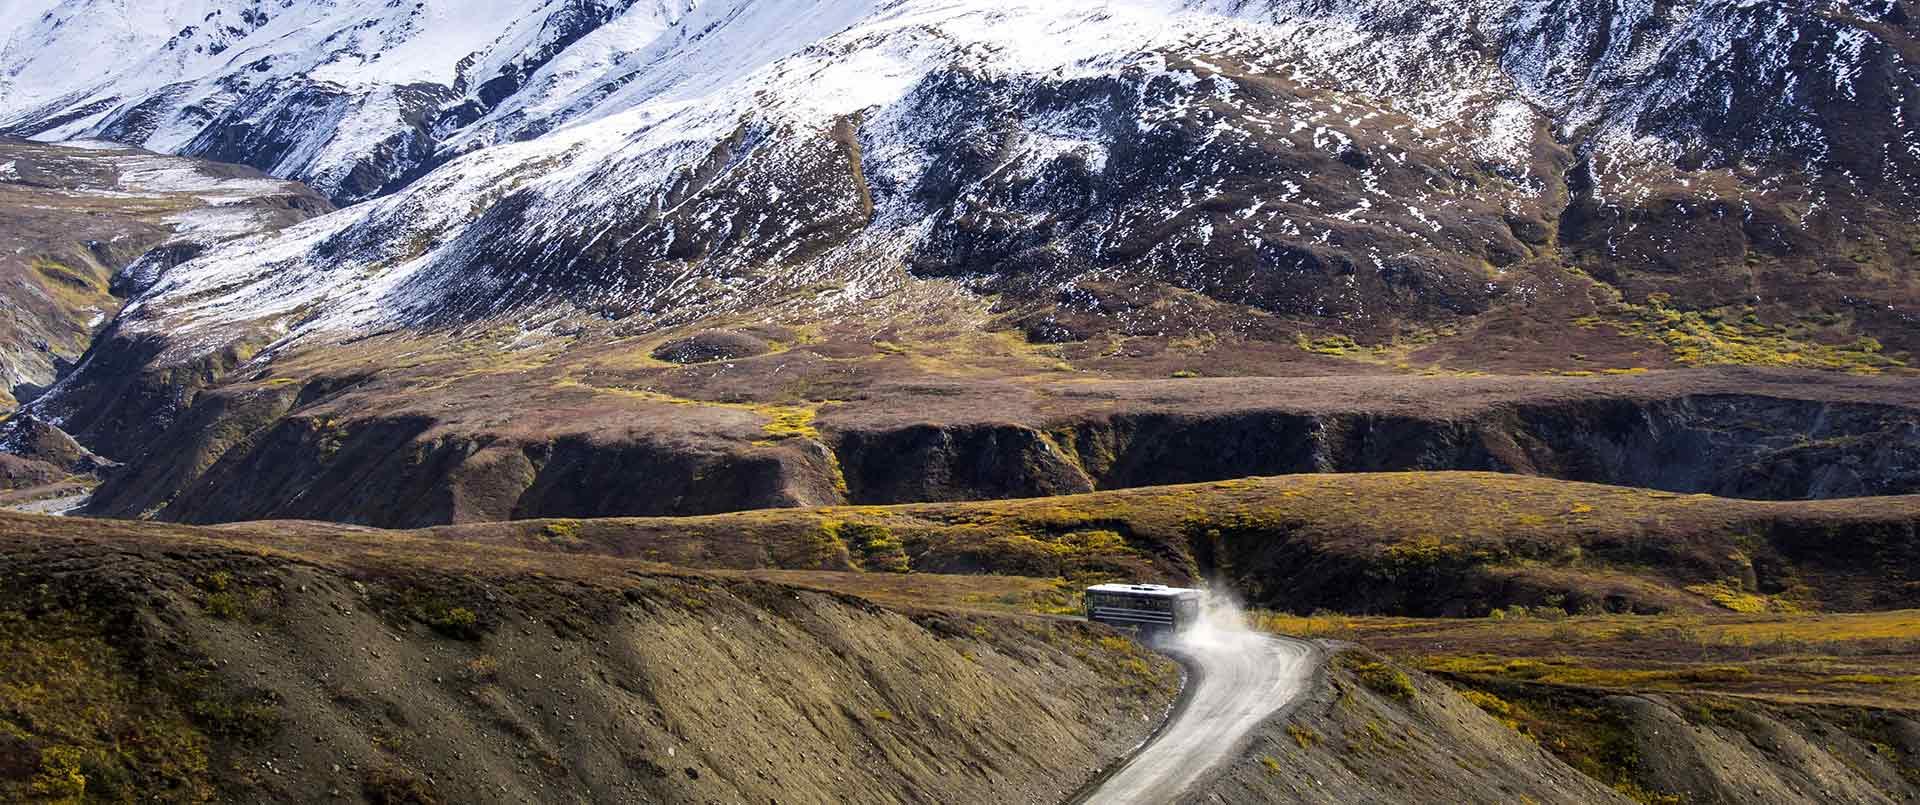 Wilderness and Wildlife - Alaska and the Yukon